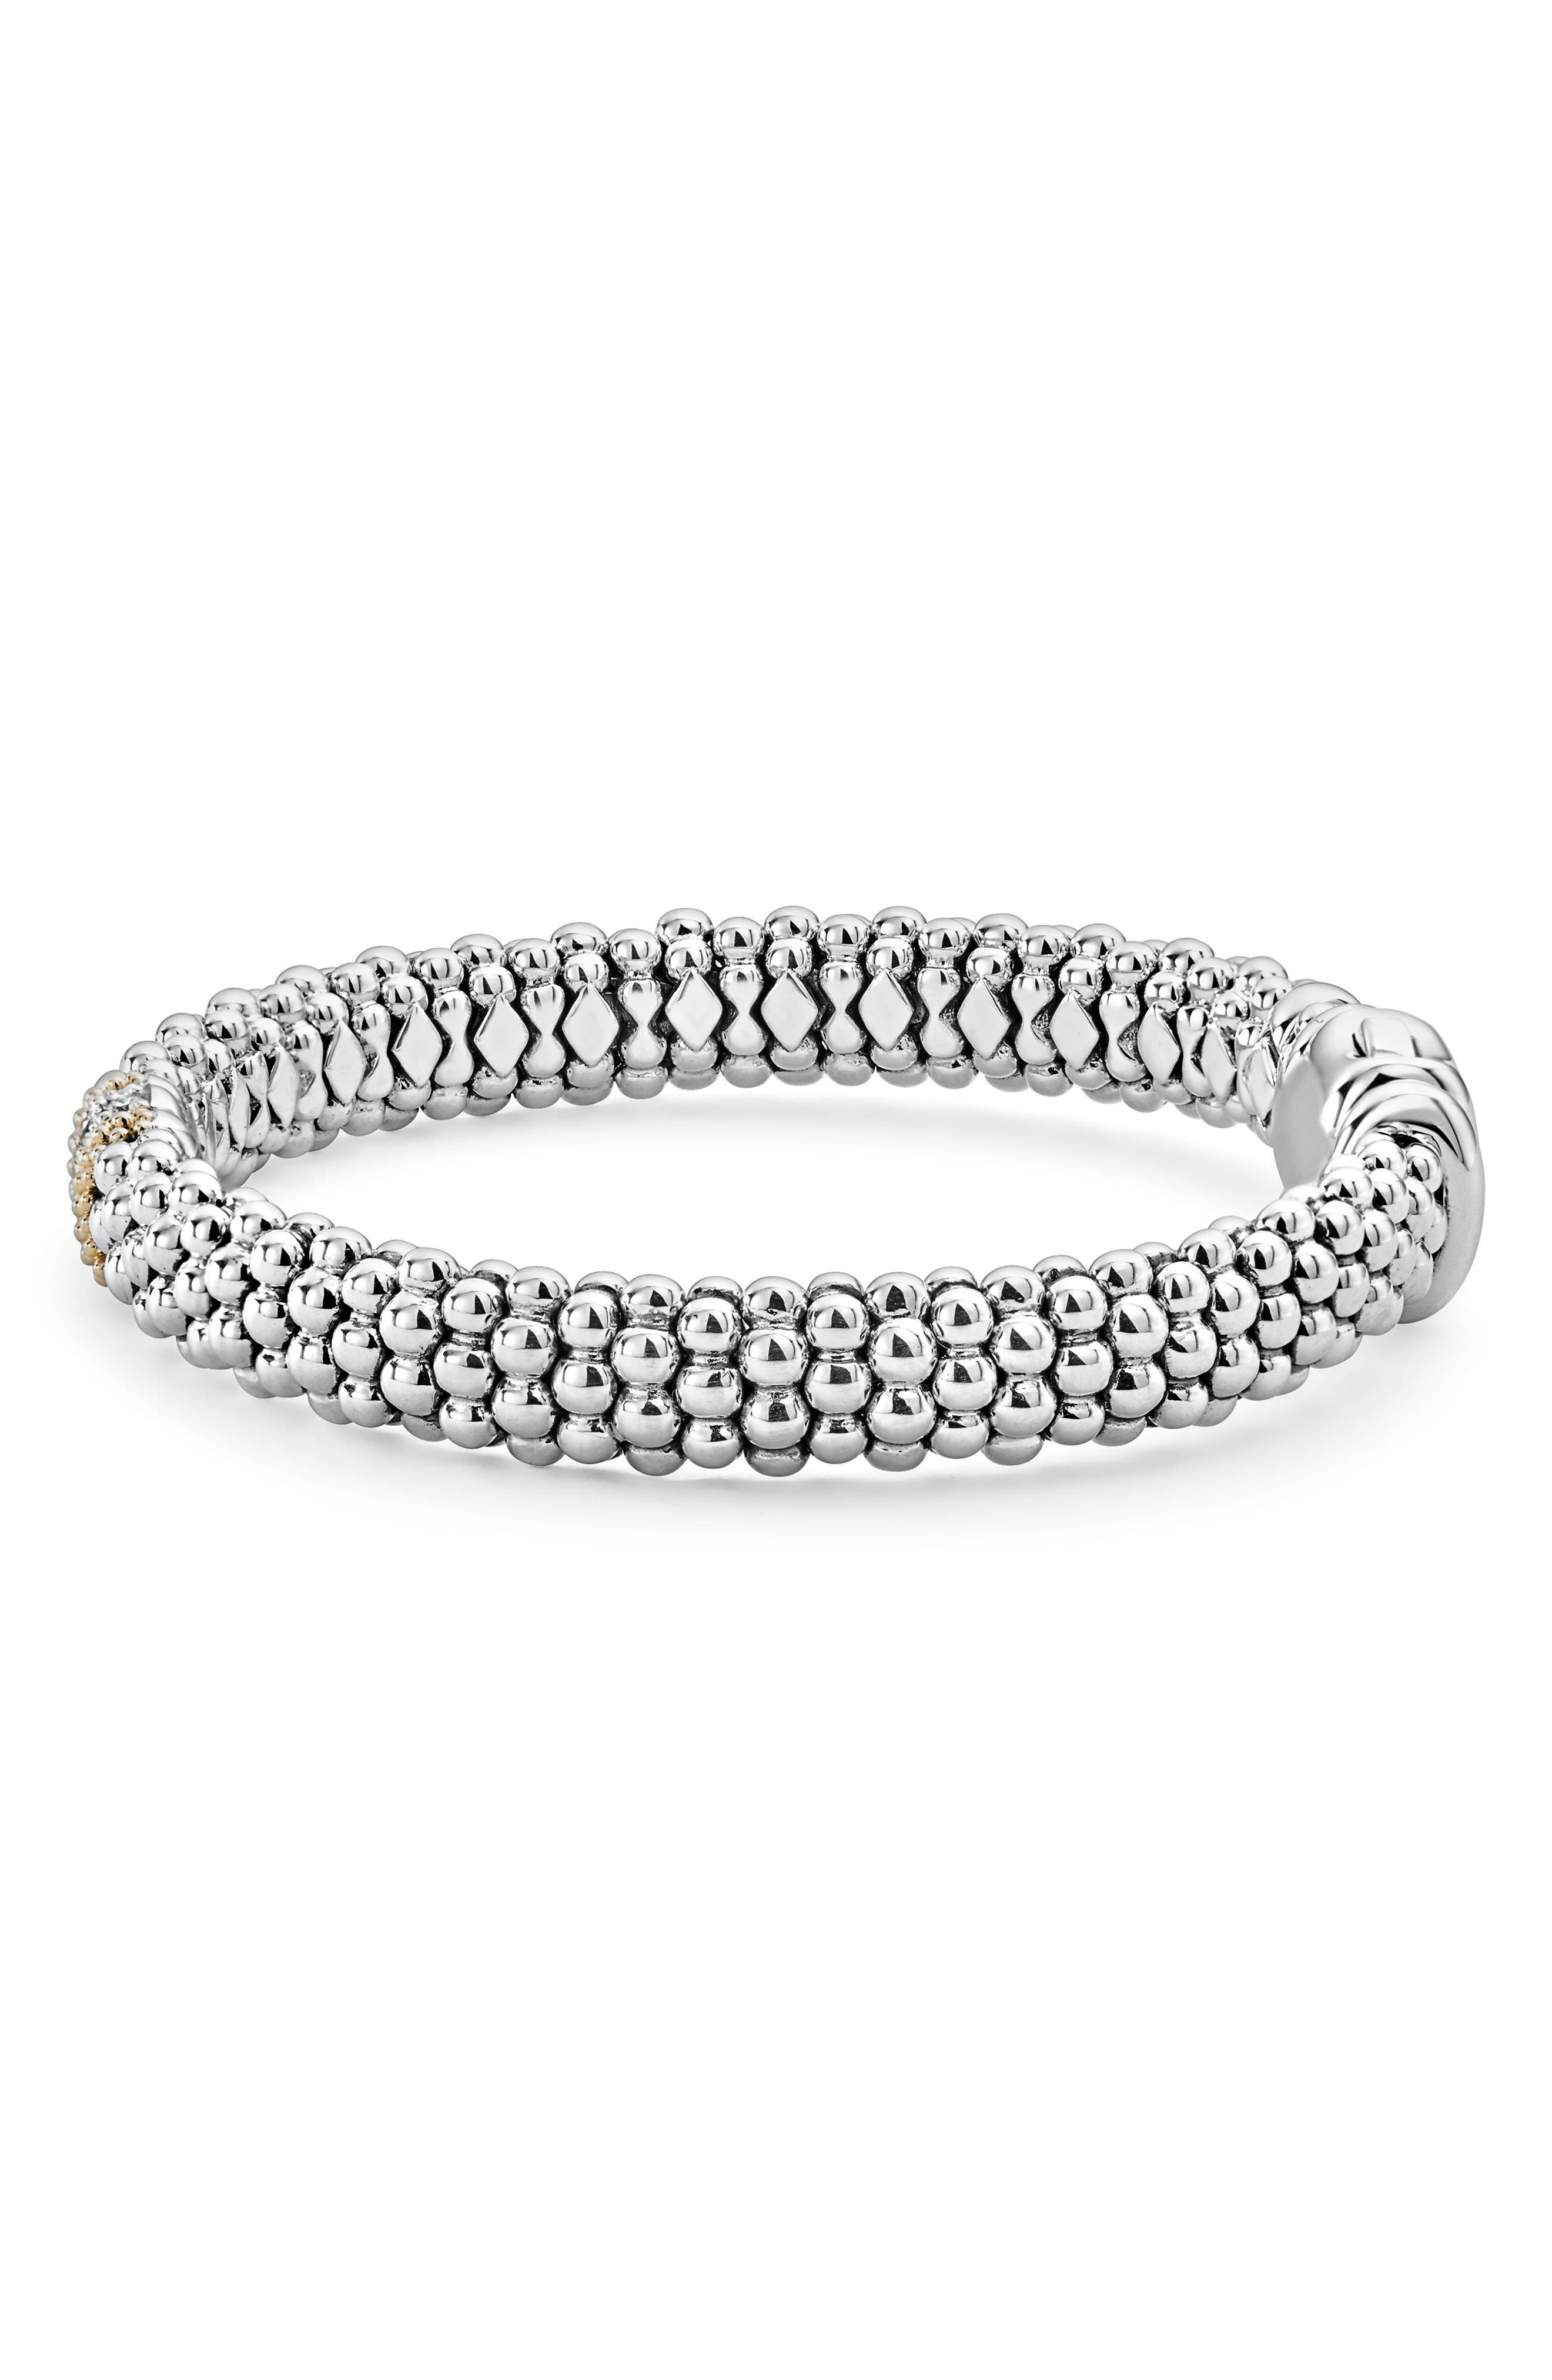 Luxe Pavé Diamond 9mm Bracelet,                             Alternate thumbnail 5, color,                             Diamond